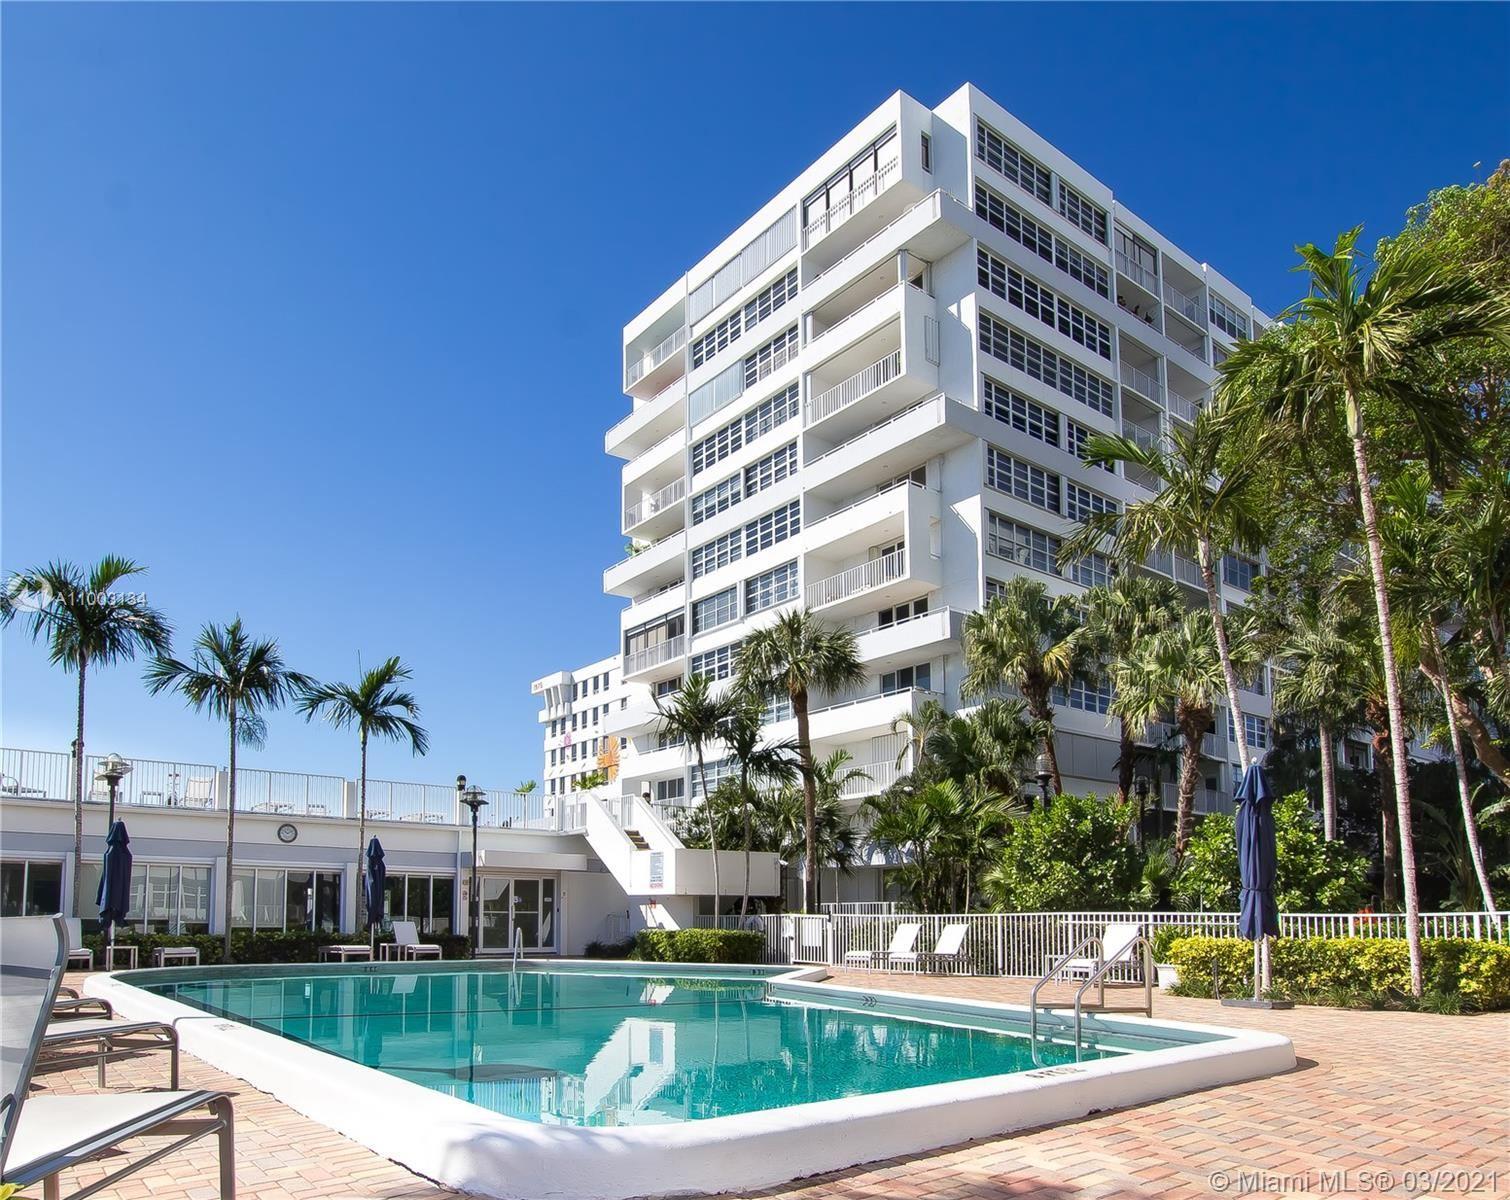 1160 N Federal Hwy #719, Fort Lauderdale, FL 33304 - #: A11003134